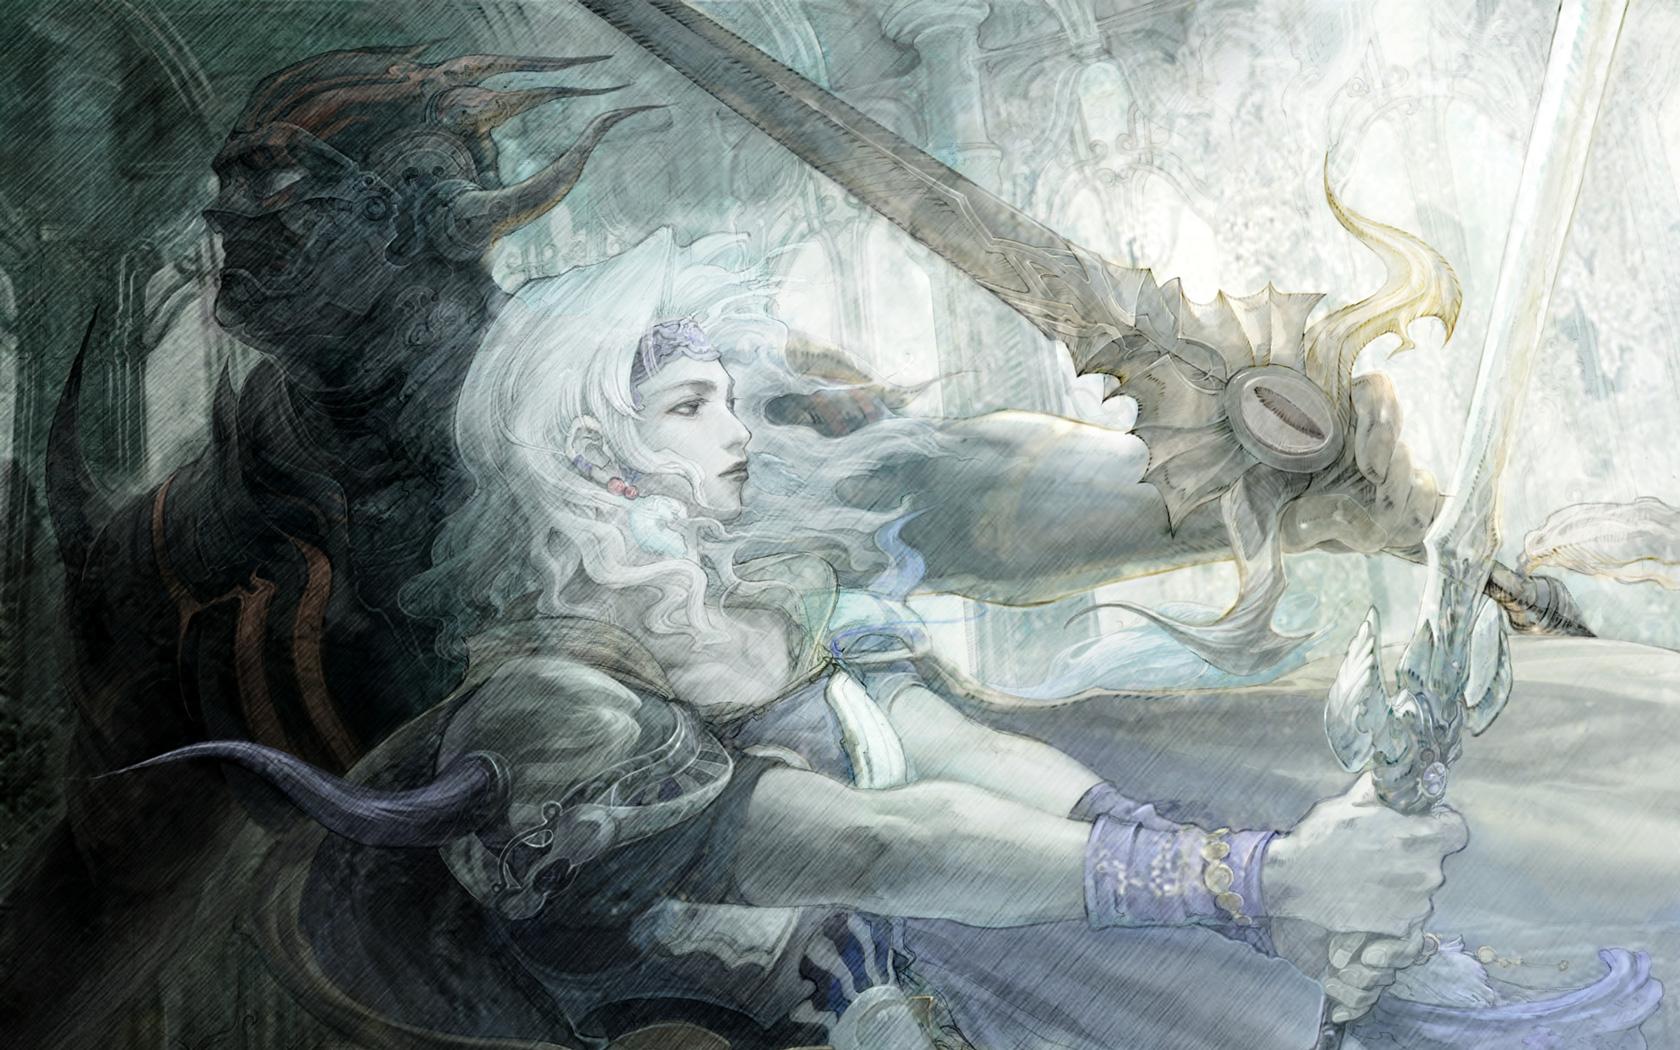 Free Final Fantasy IV Wallpaper in 1680x1050